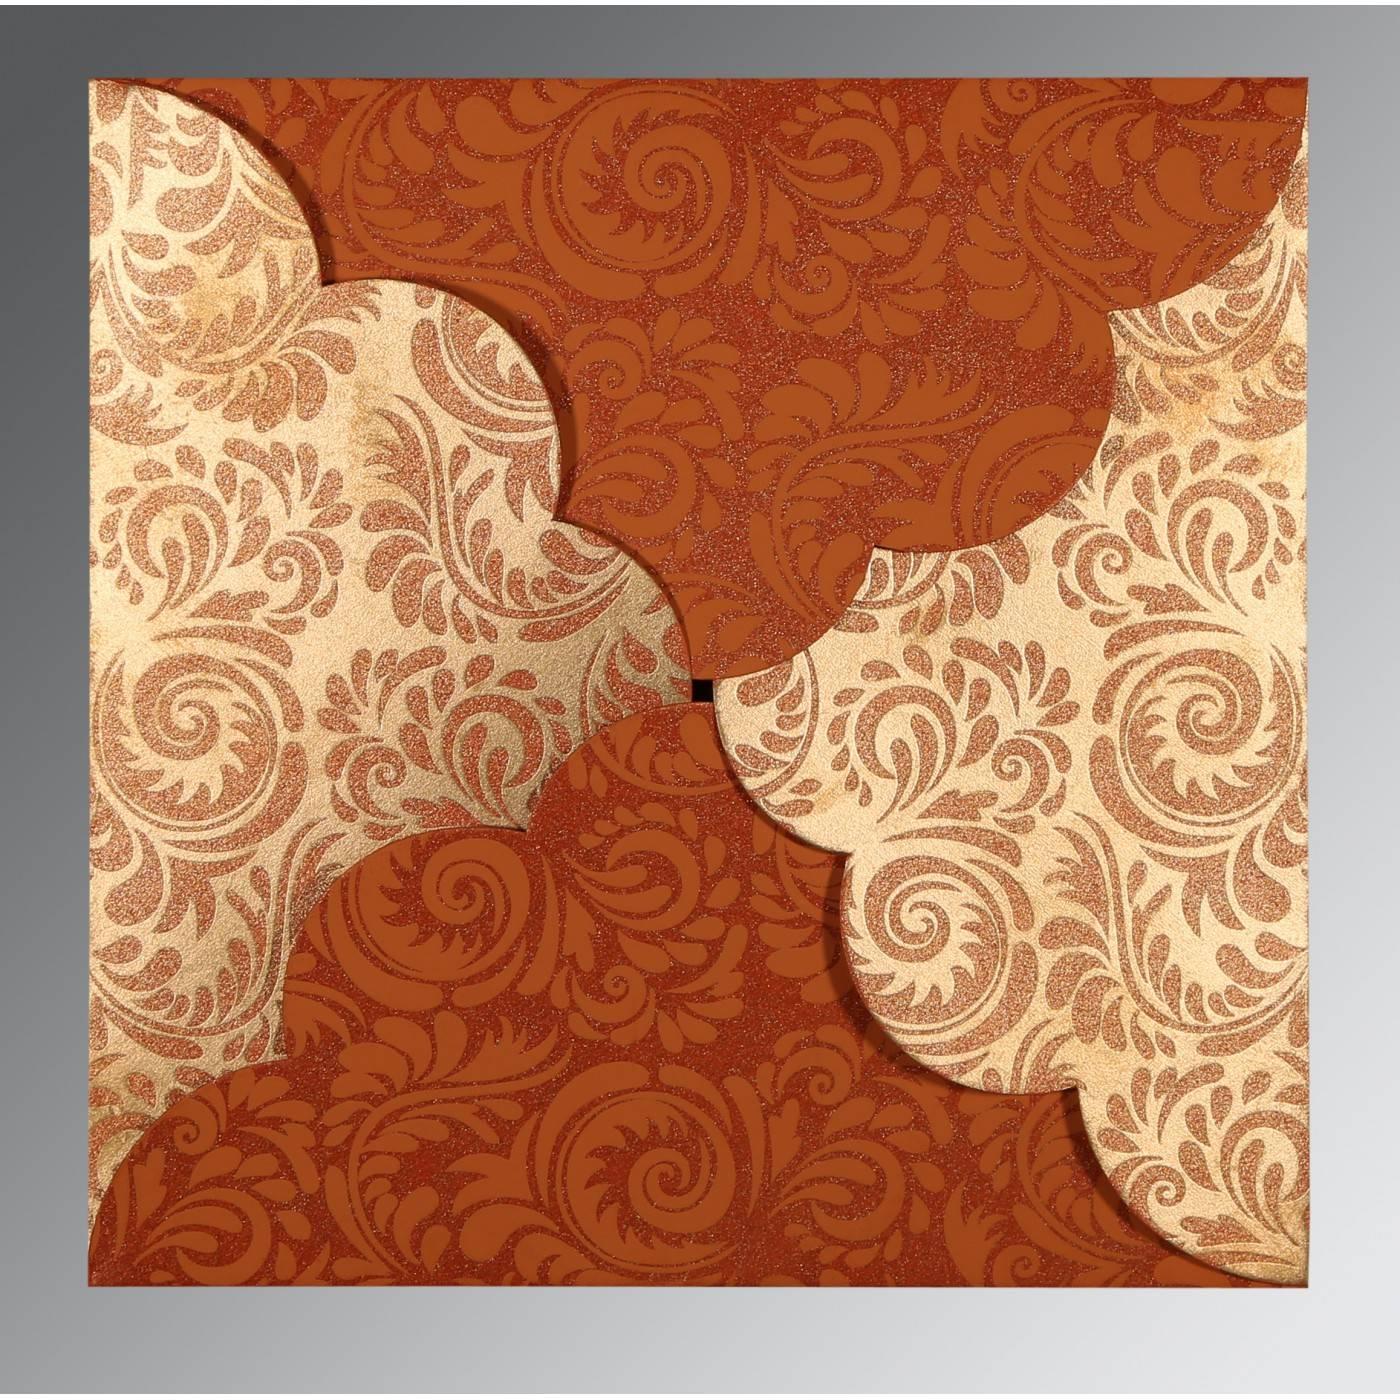 ORANGE SHIMMERY FLORAL THEMED - SCREEN PRINTED WEDDING CARD : CD-8235G - IndianWeddingCards